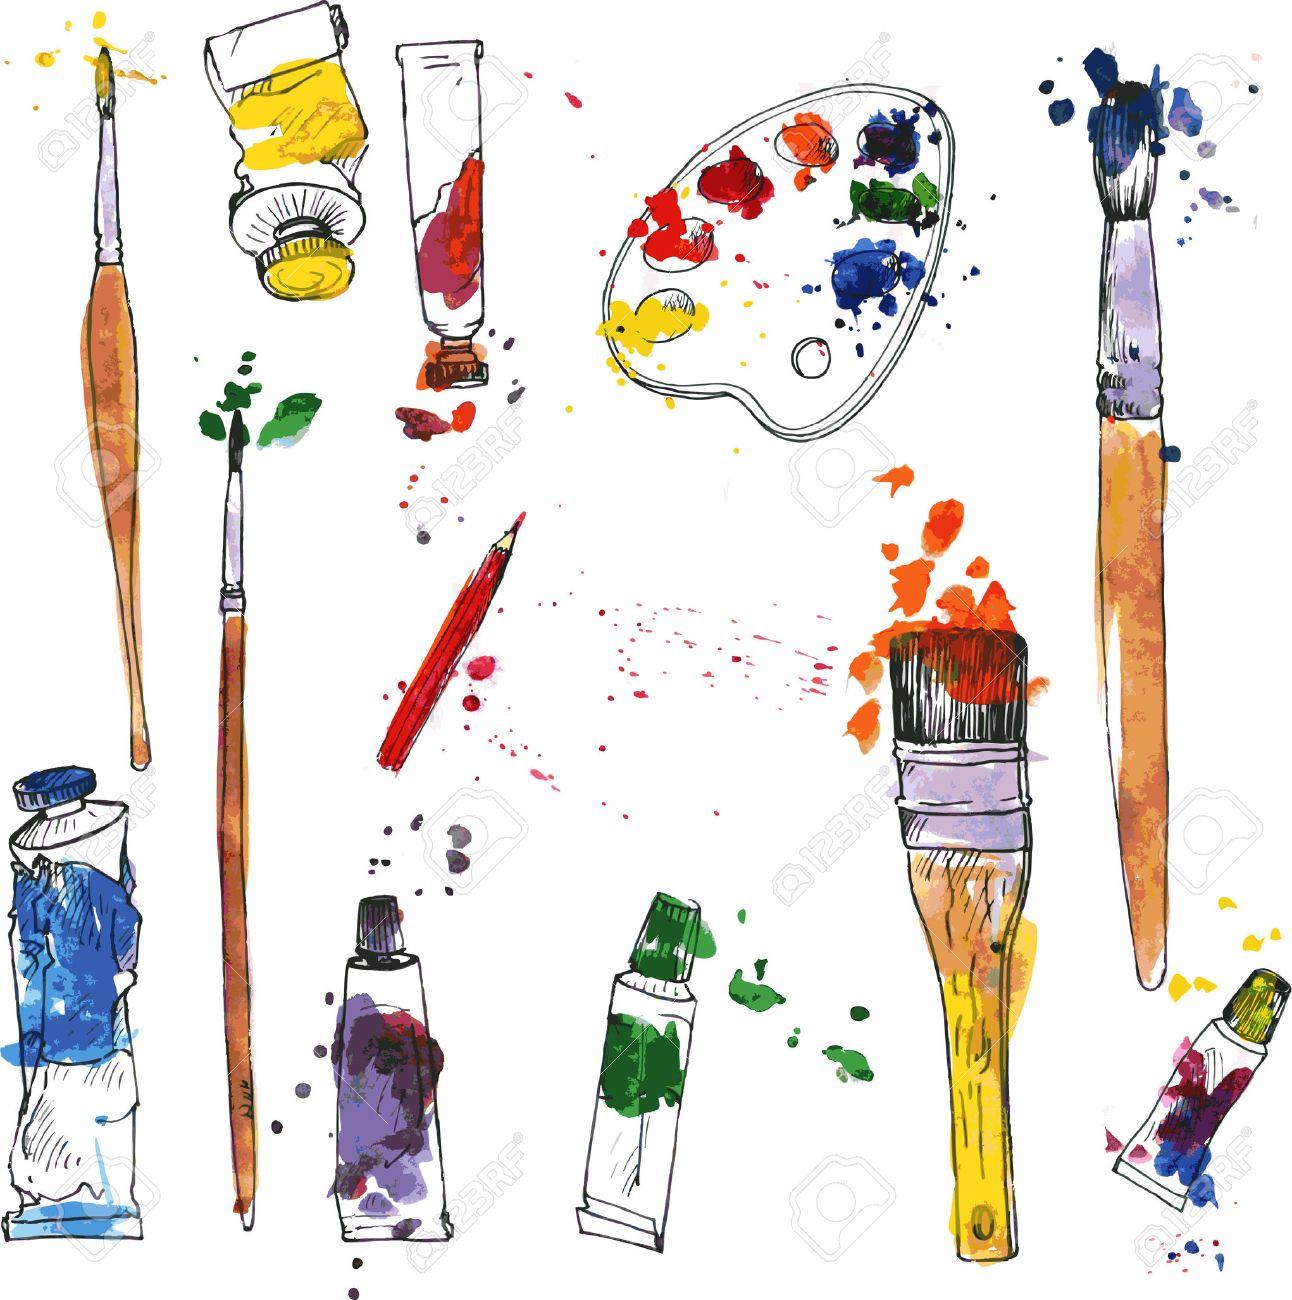 Supplies drawing at getdrawings. Art clipart art material